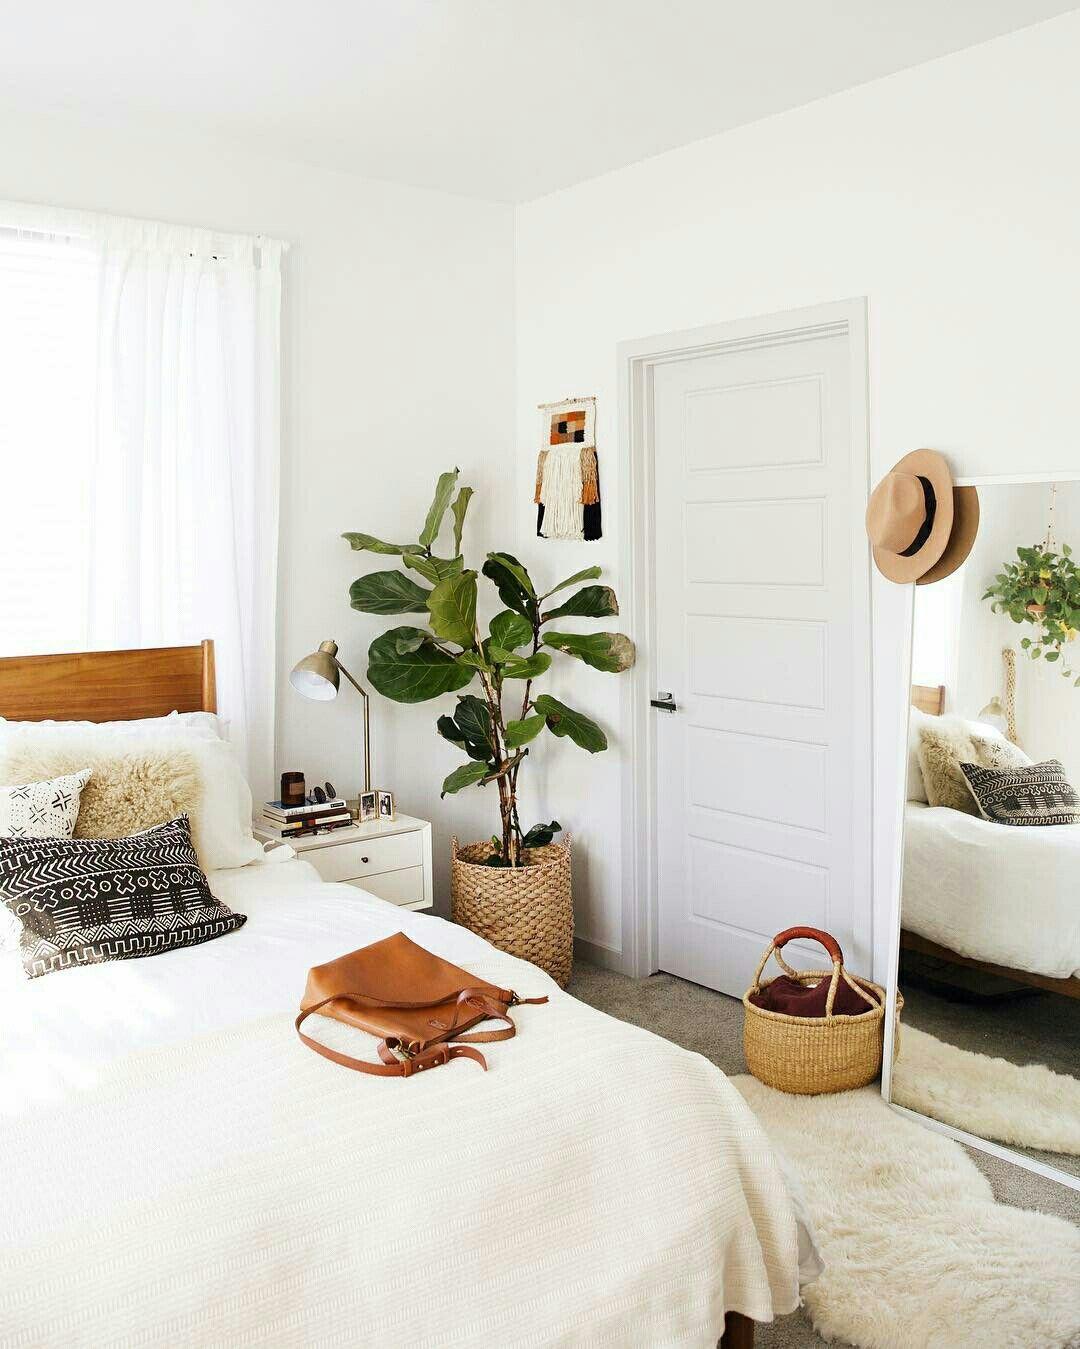 Bedroom Decor Natural Boho Plants Flowers Simple